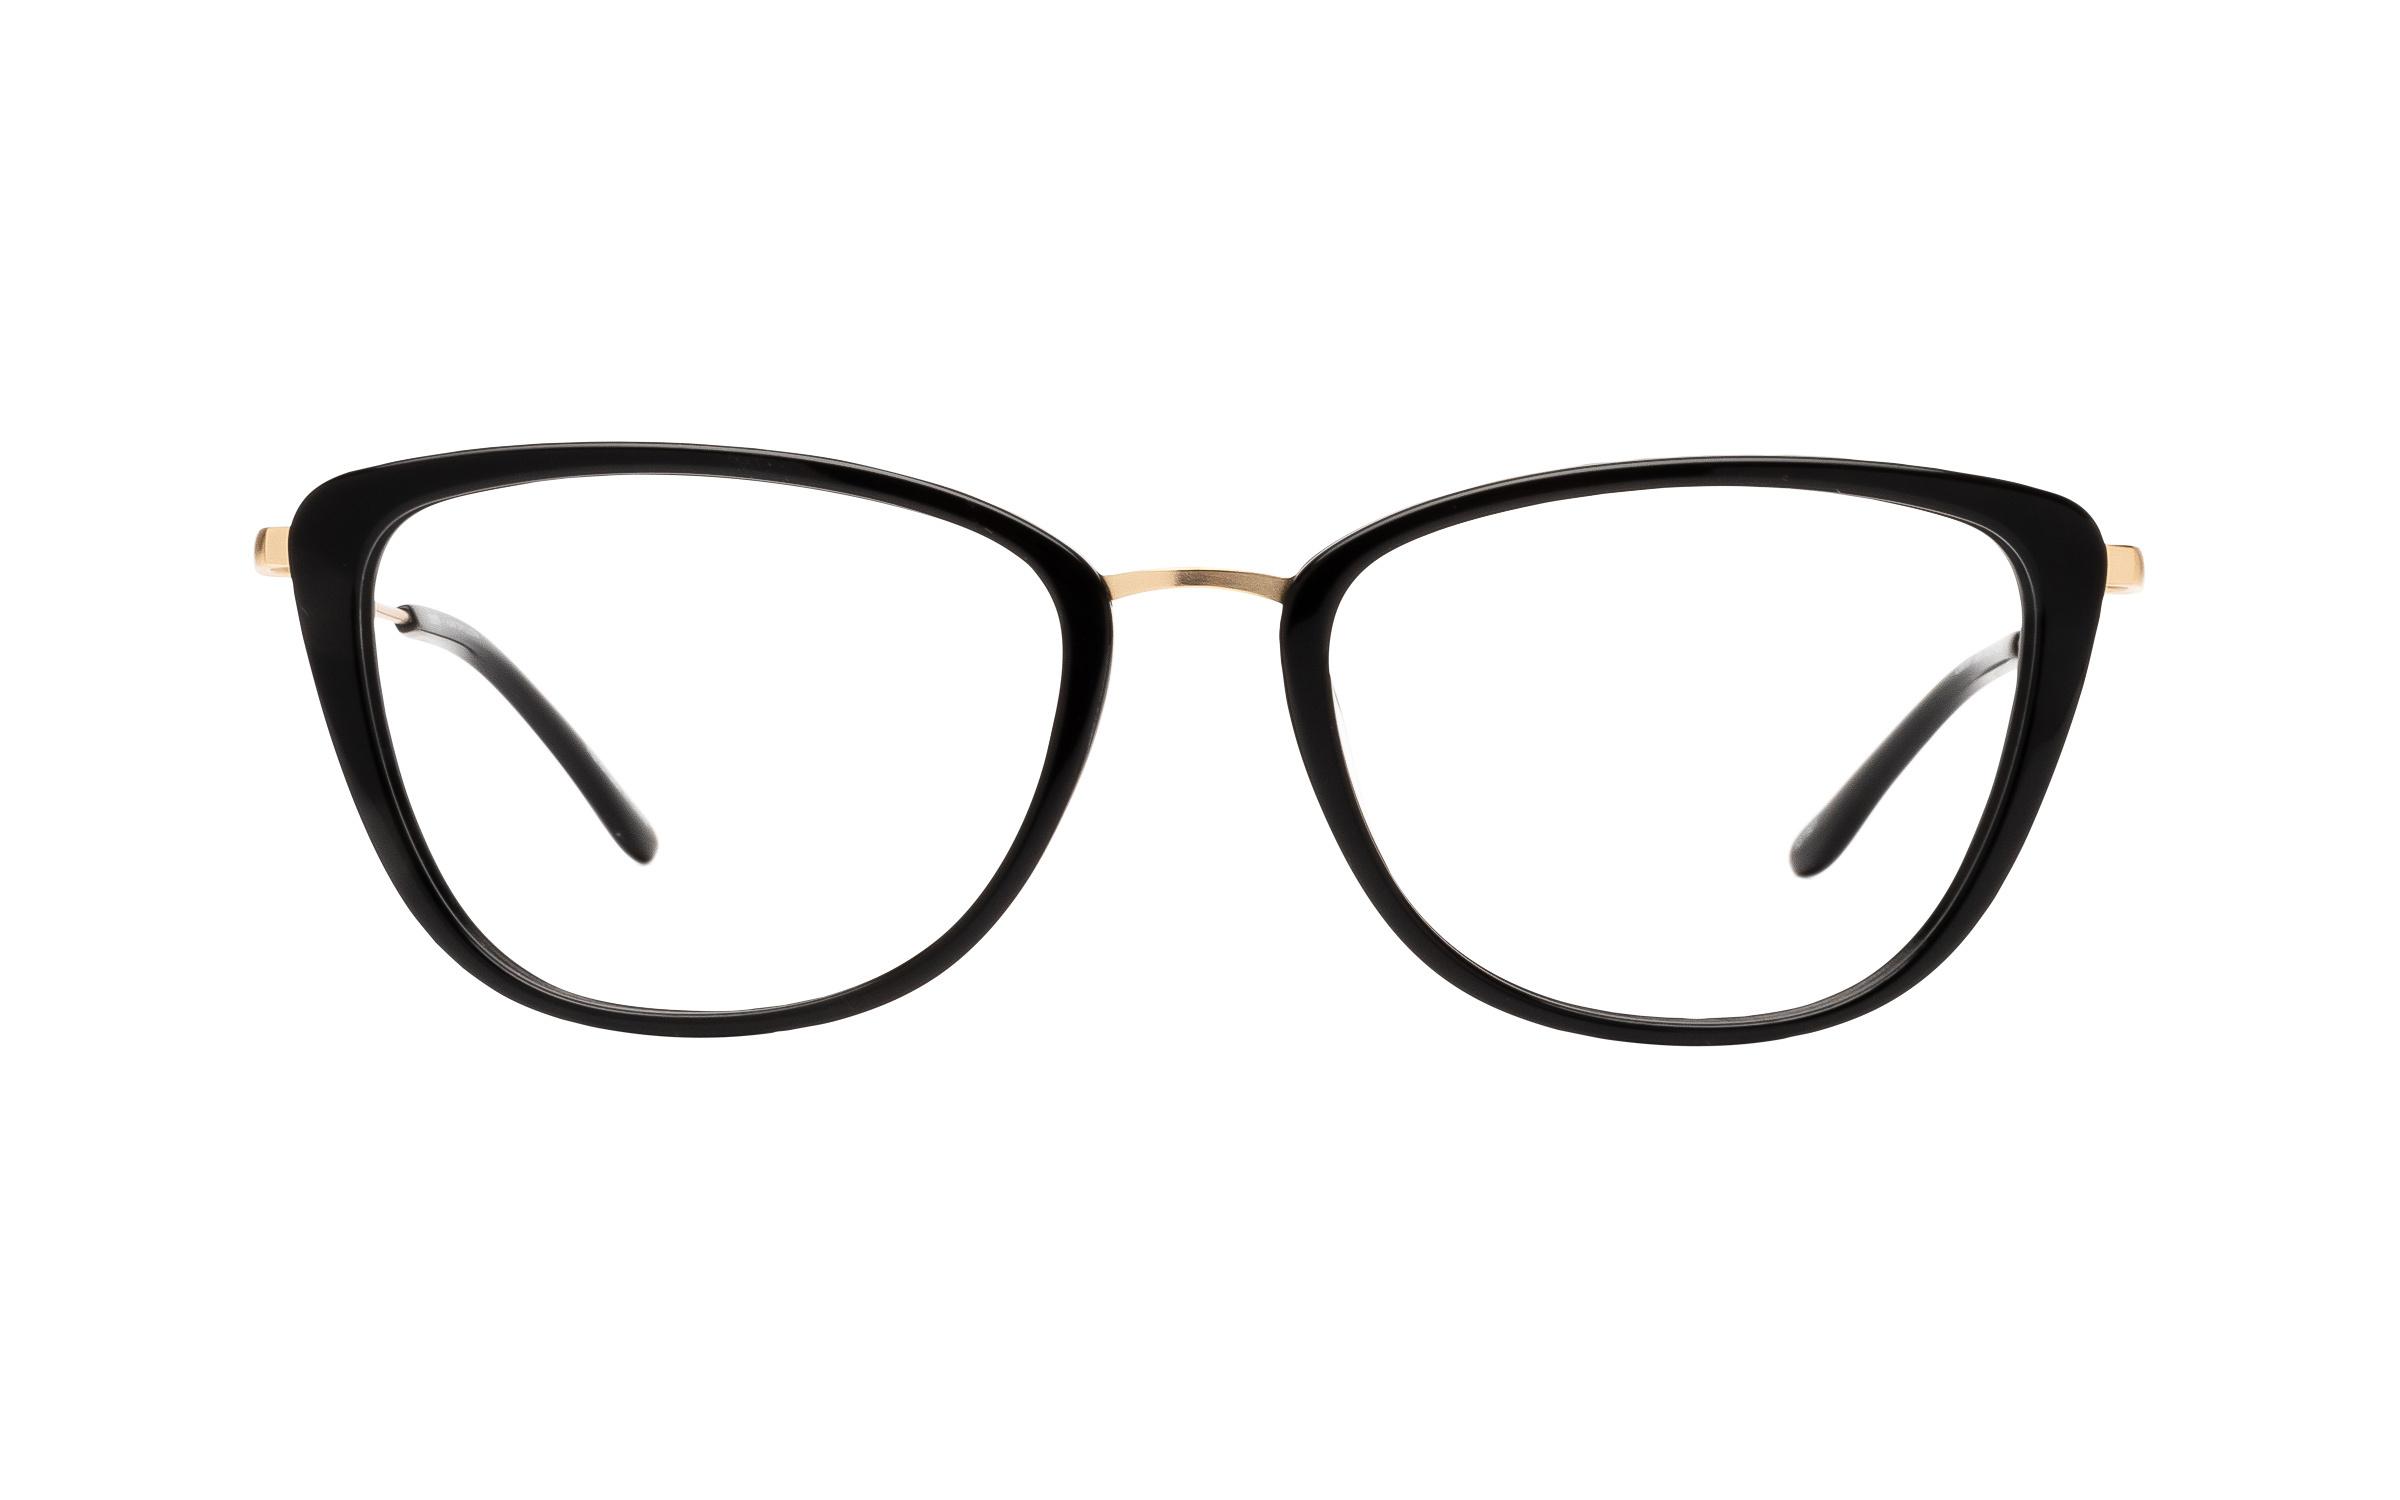 Kam Dhillon Lauren (54) Eyeglasses and Frame in Black | Acetate/Metal - Online Coastal